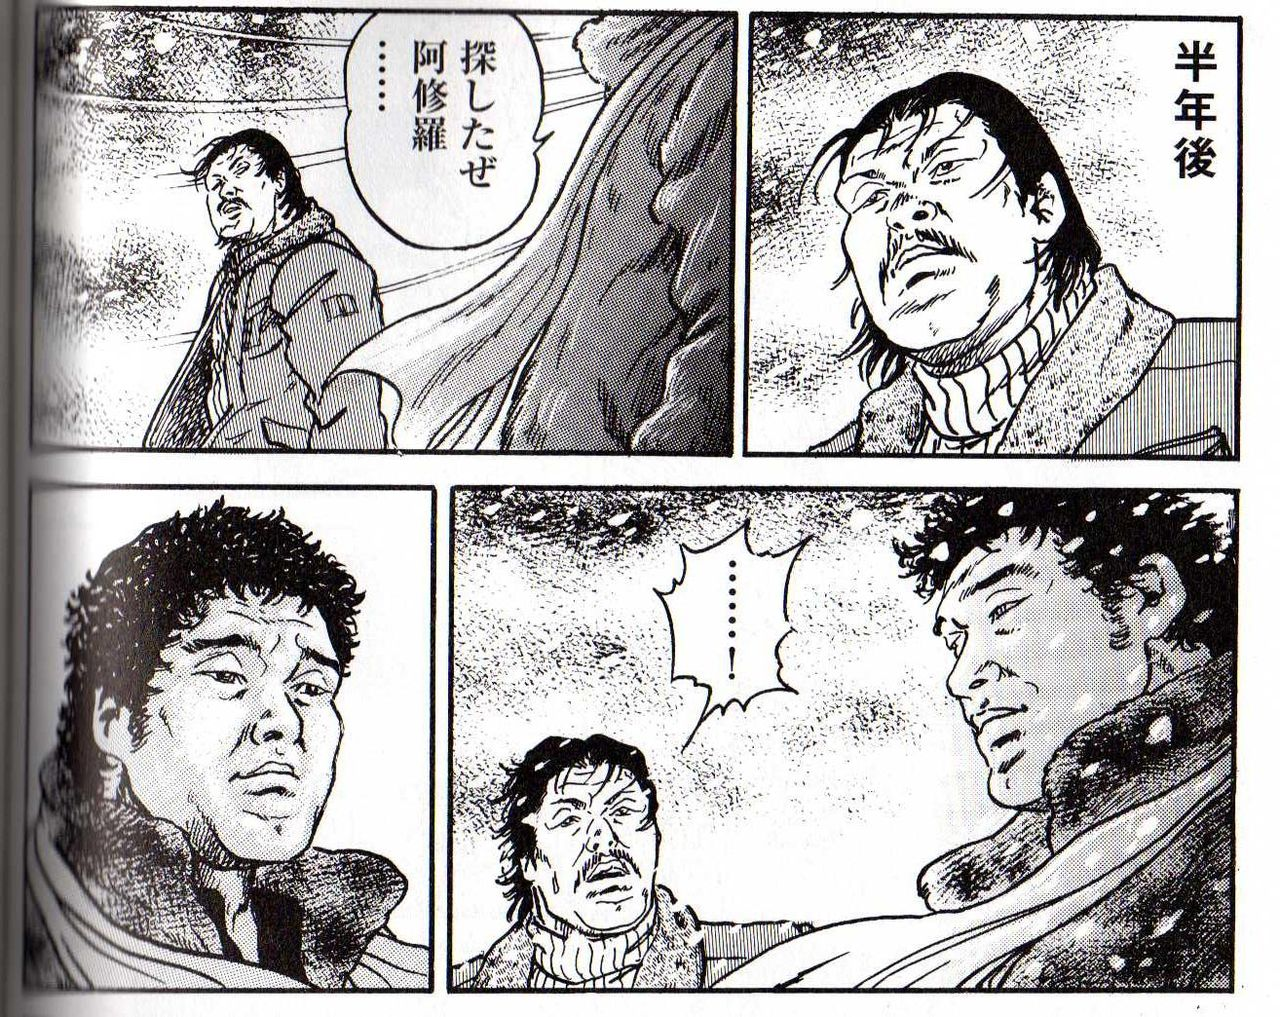 https://i1.wp.com/livedoor.blogimg.jp/th302d/imgs/9/a/9afe0ed2.jpg